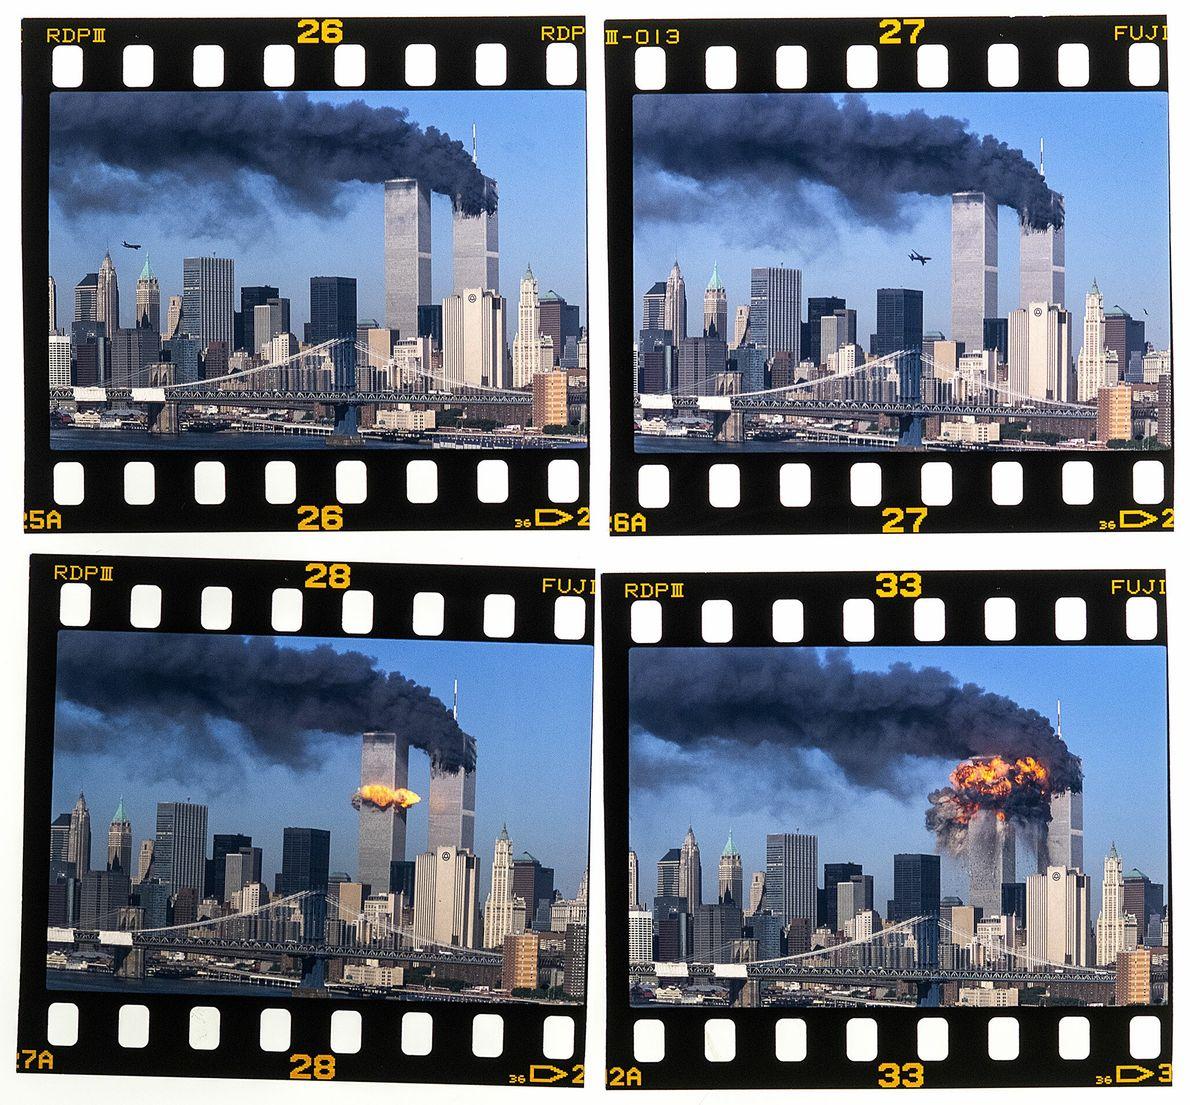 2001  O início do século 21 foi marcado pelos ataques terroristas de 11 de setembro de 2001. ...